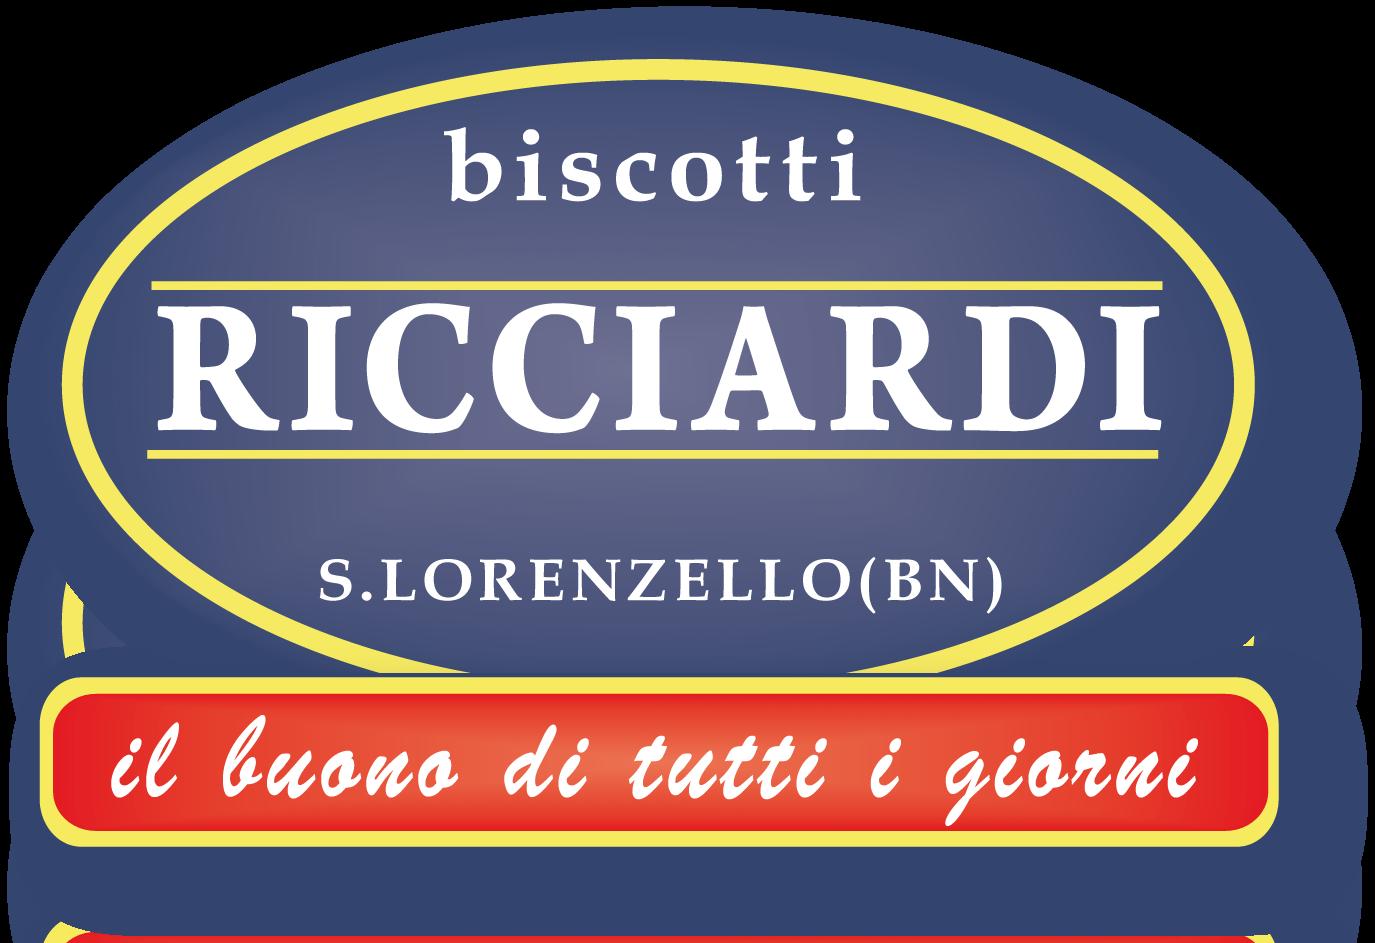 Biscotti Ricciardi